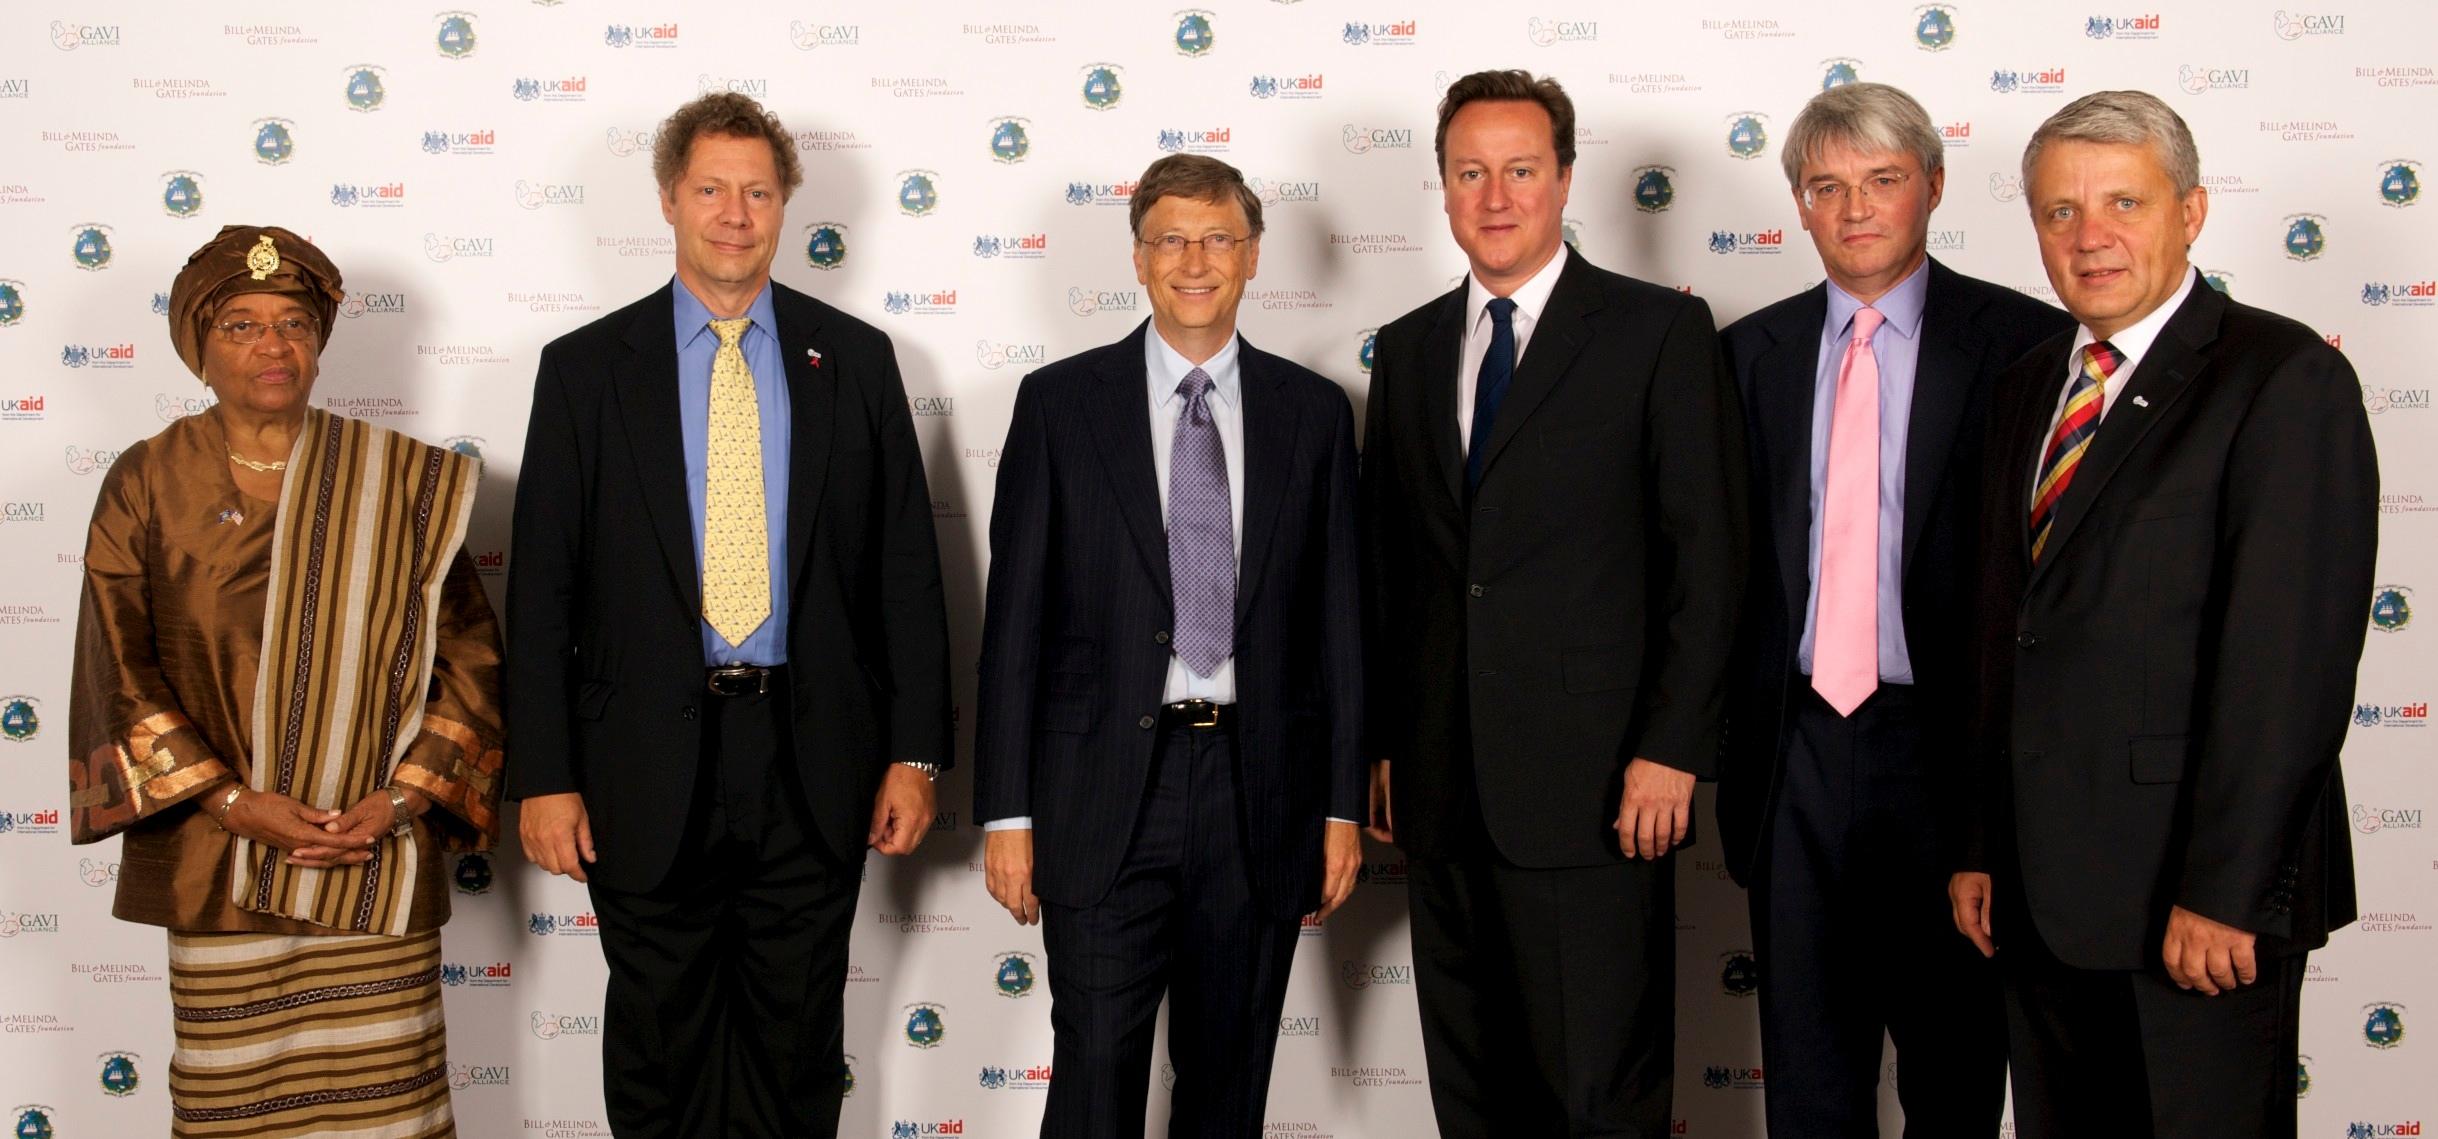 FileDavid Cameron Andrew Mitchell Bill Gates and Ellen